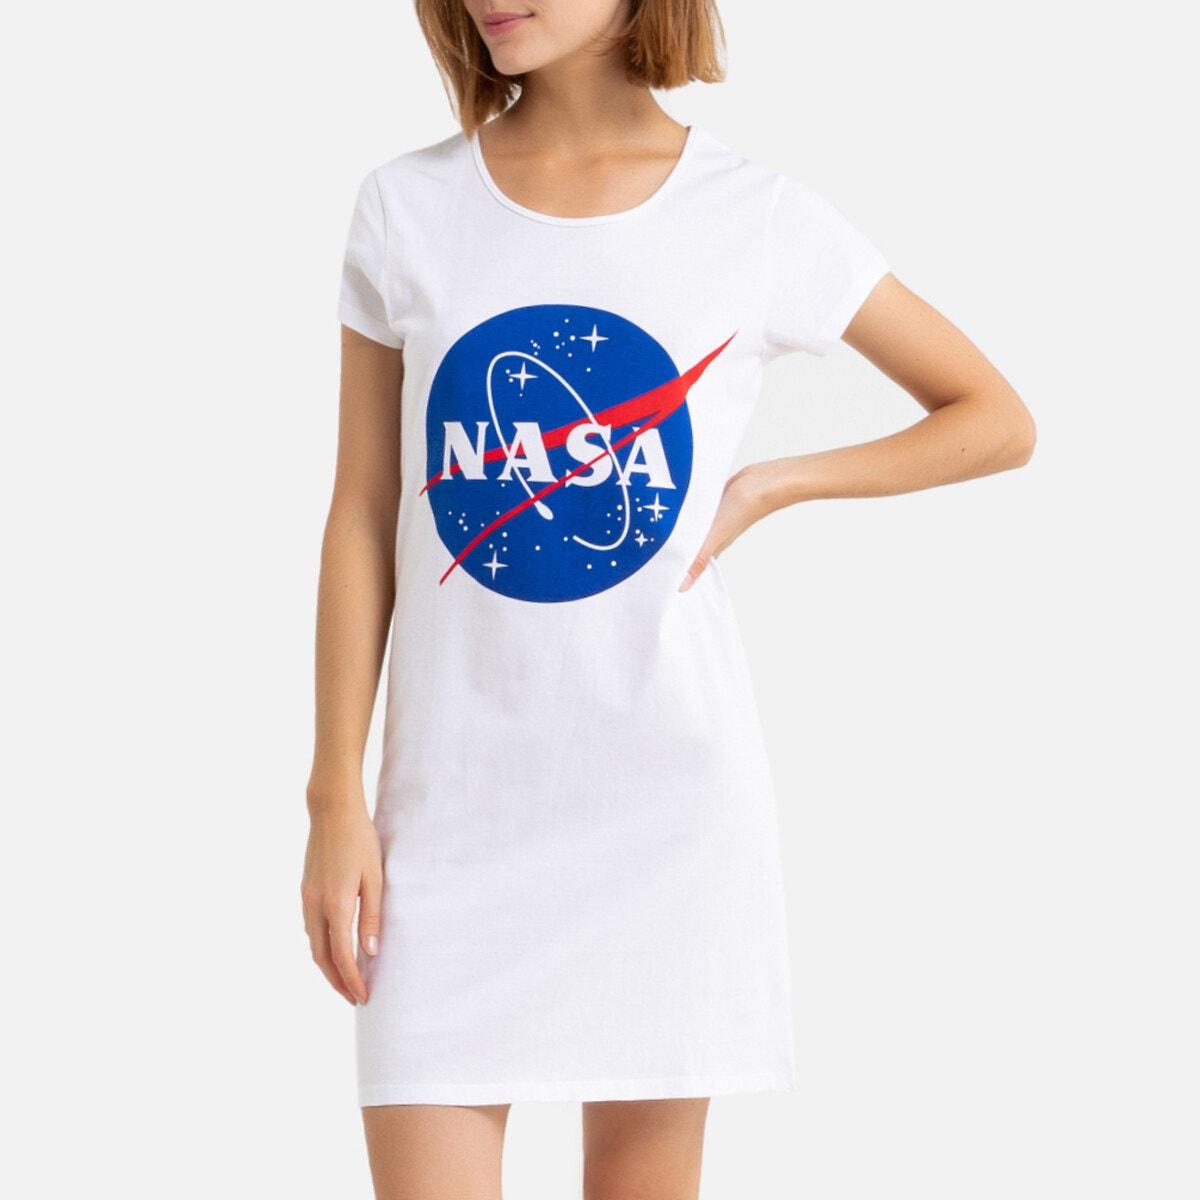 Nasa - Νυχτικό σε γραμμή T-shirt, Nasa - 10465